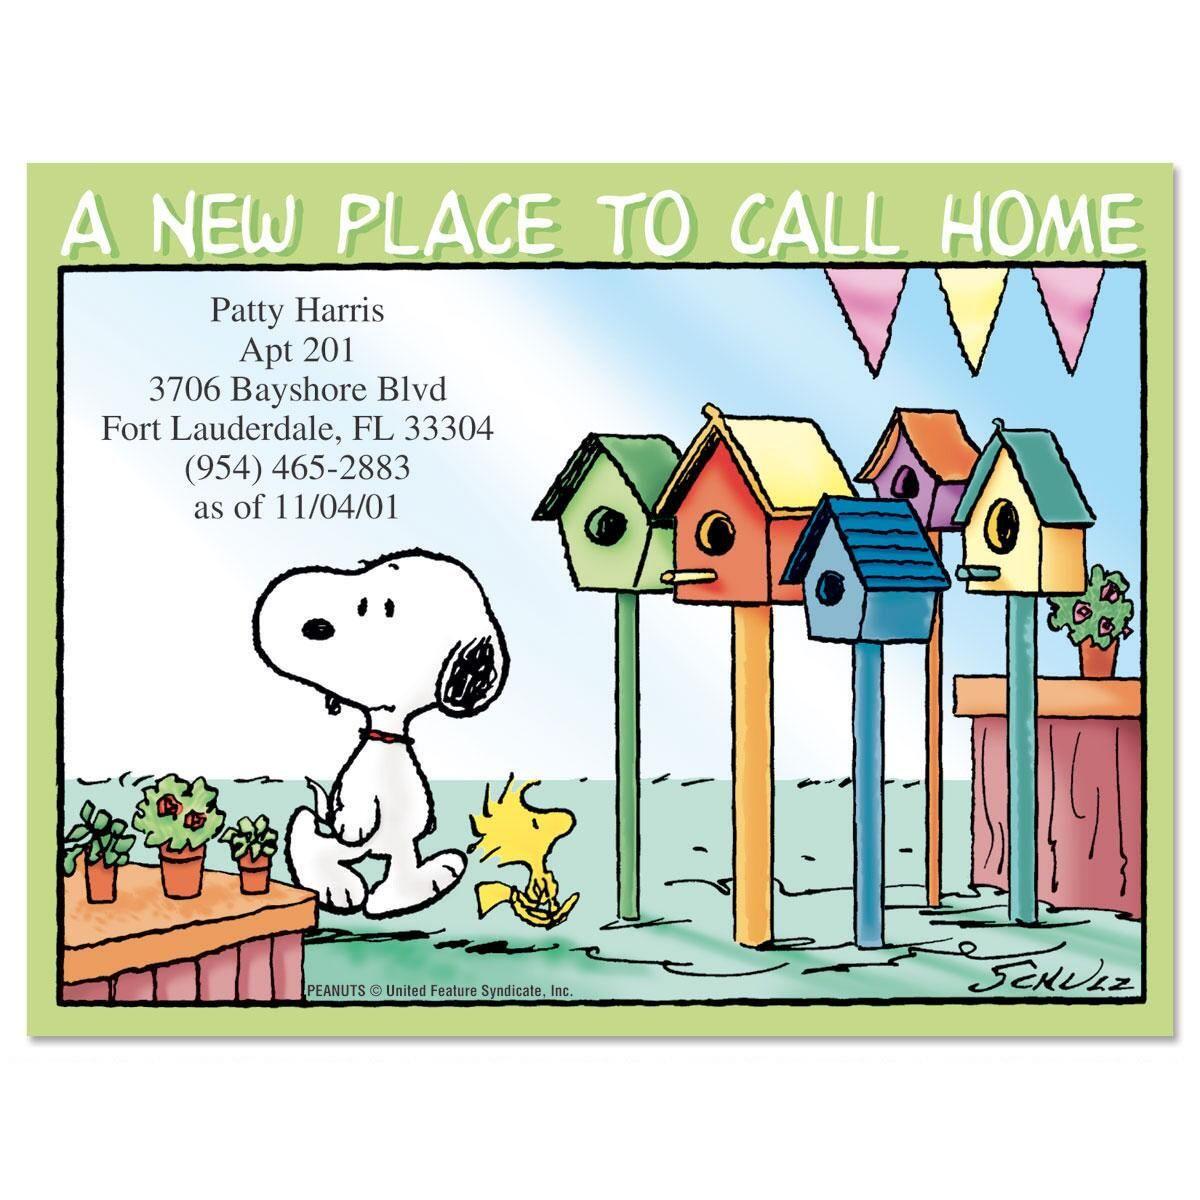 PEANUTS® House Hunting  Postcards